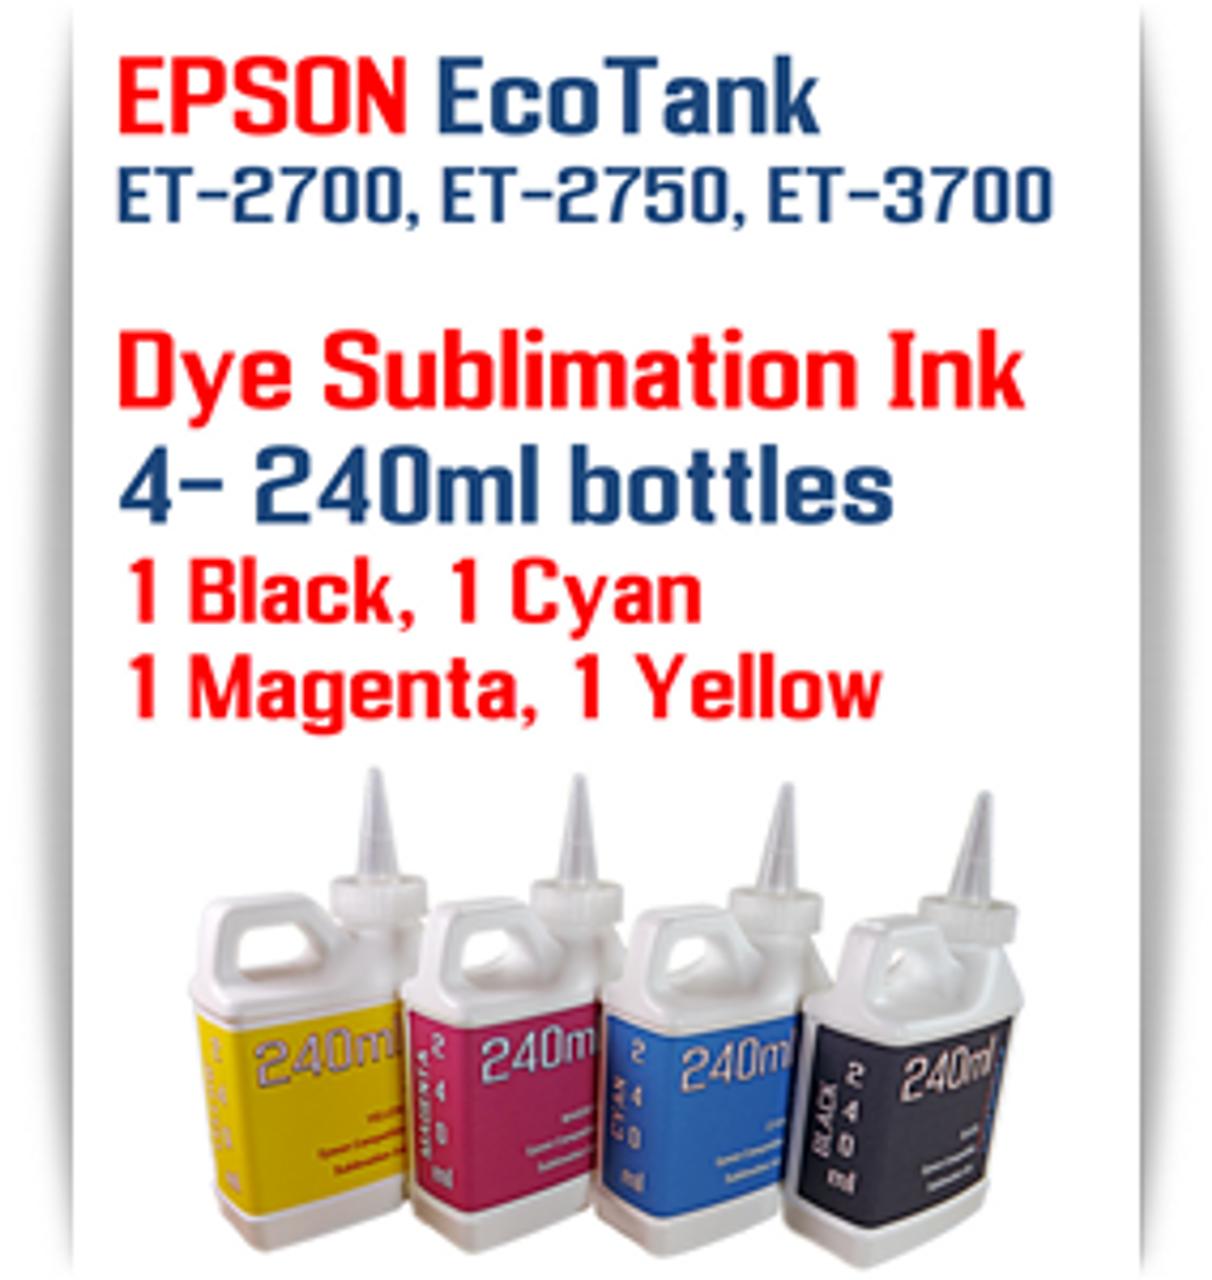 4- 240ml bottles EPSON EcoTank ET-2700, ET-2750, ET-3700 Dye Sublimation Ink